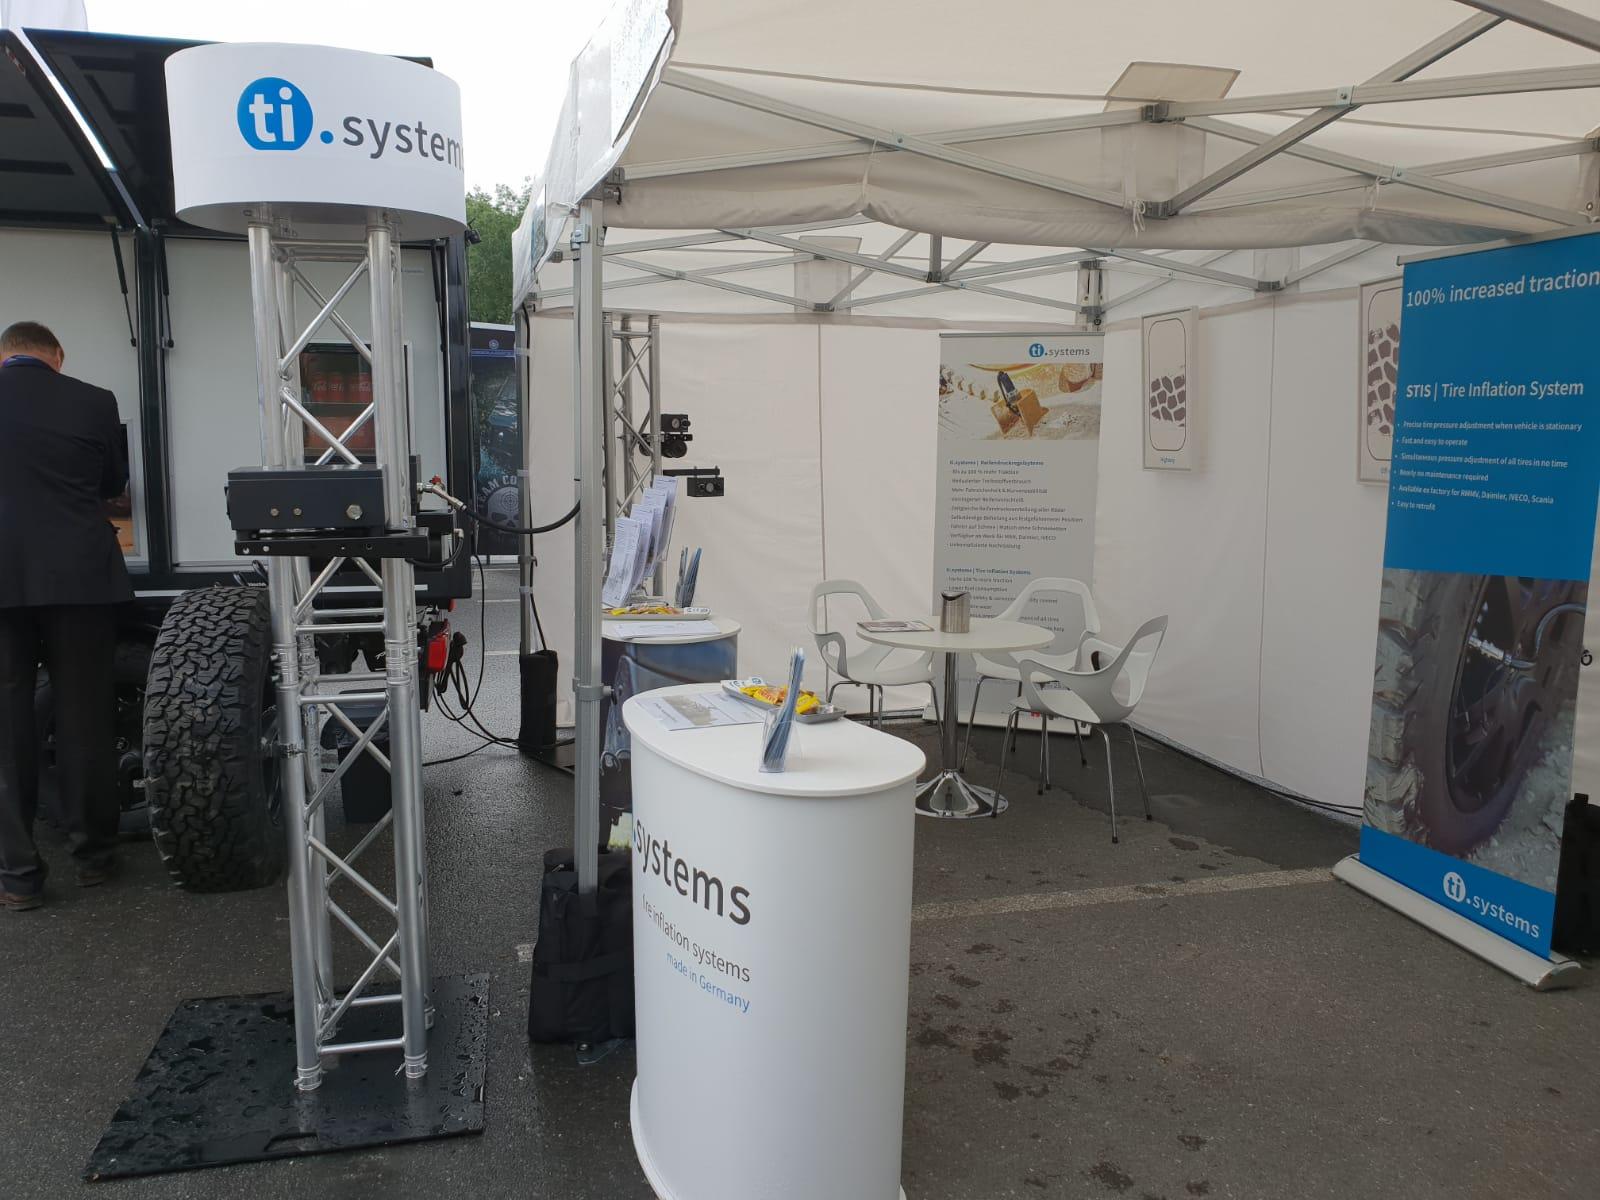 Eurosatory 2018 ti.systems booth 1